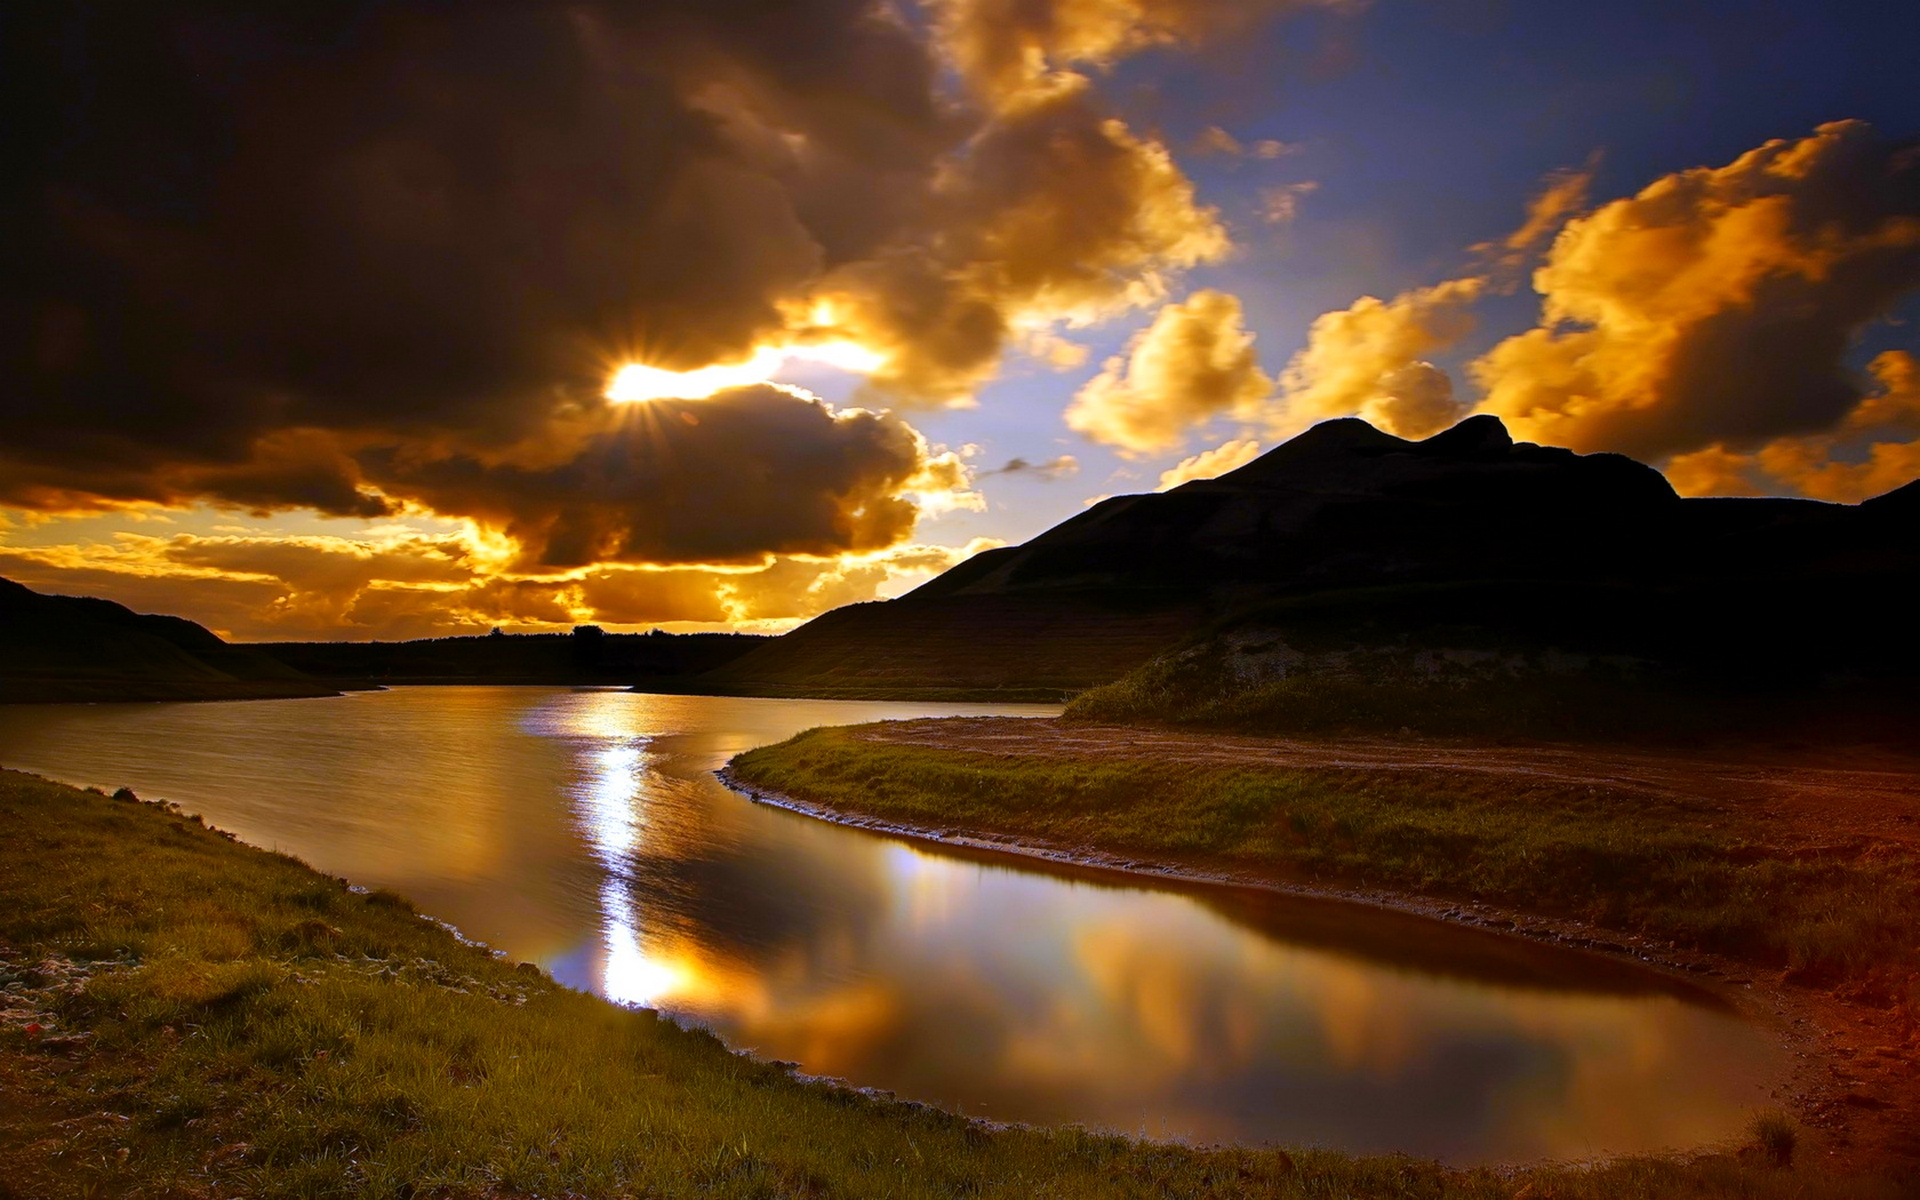 nature desktop clouds glory background sky landscape god sun hidden story sunset gods earth wallpapers stealing reflection sunrise lakes mac